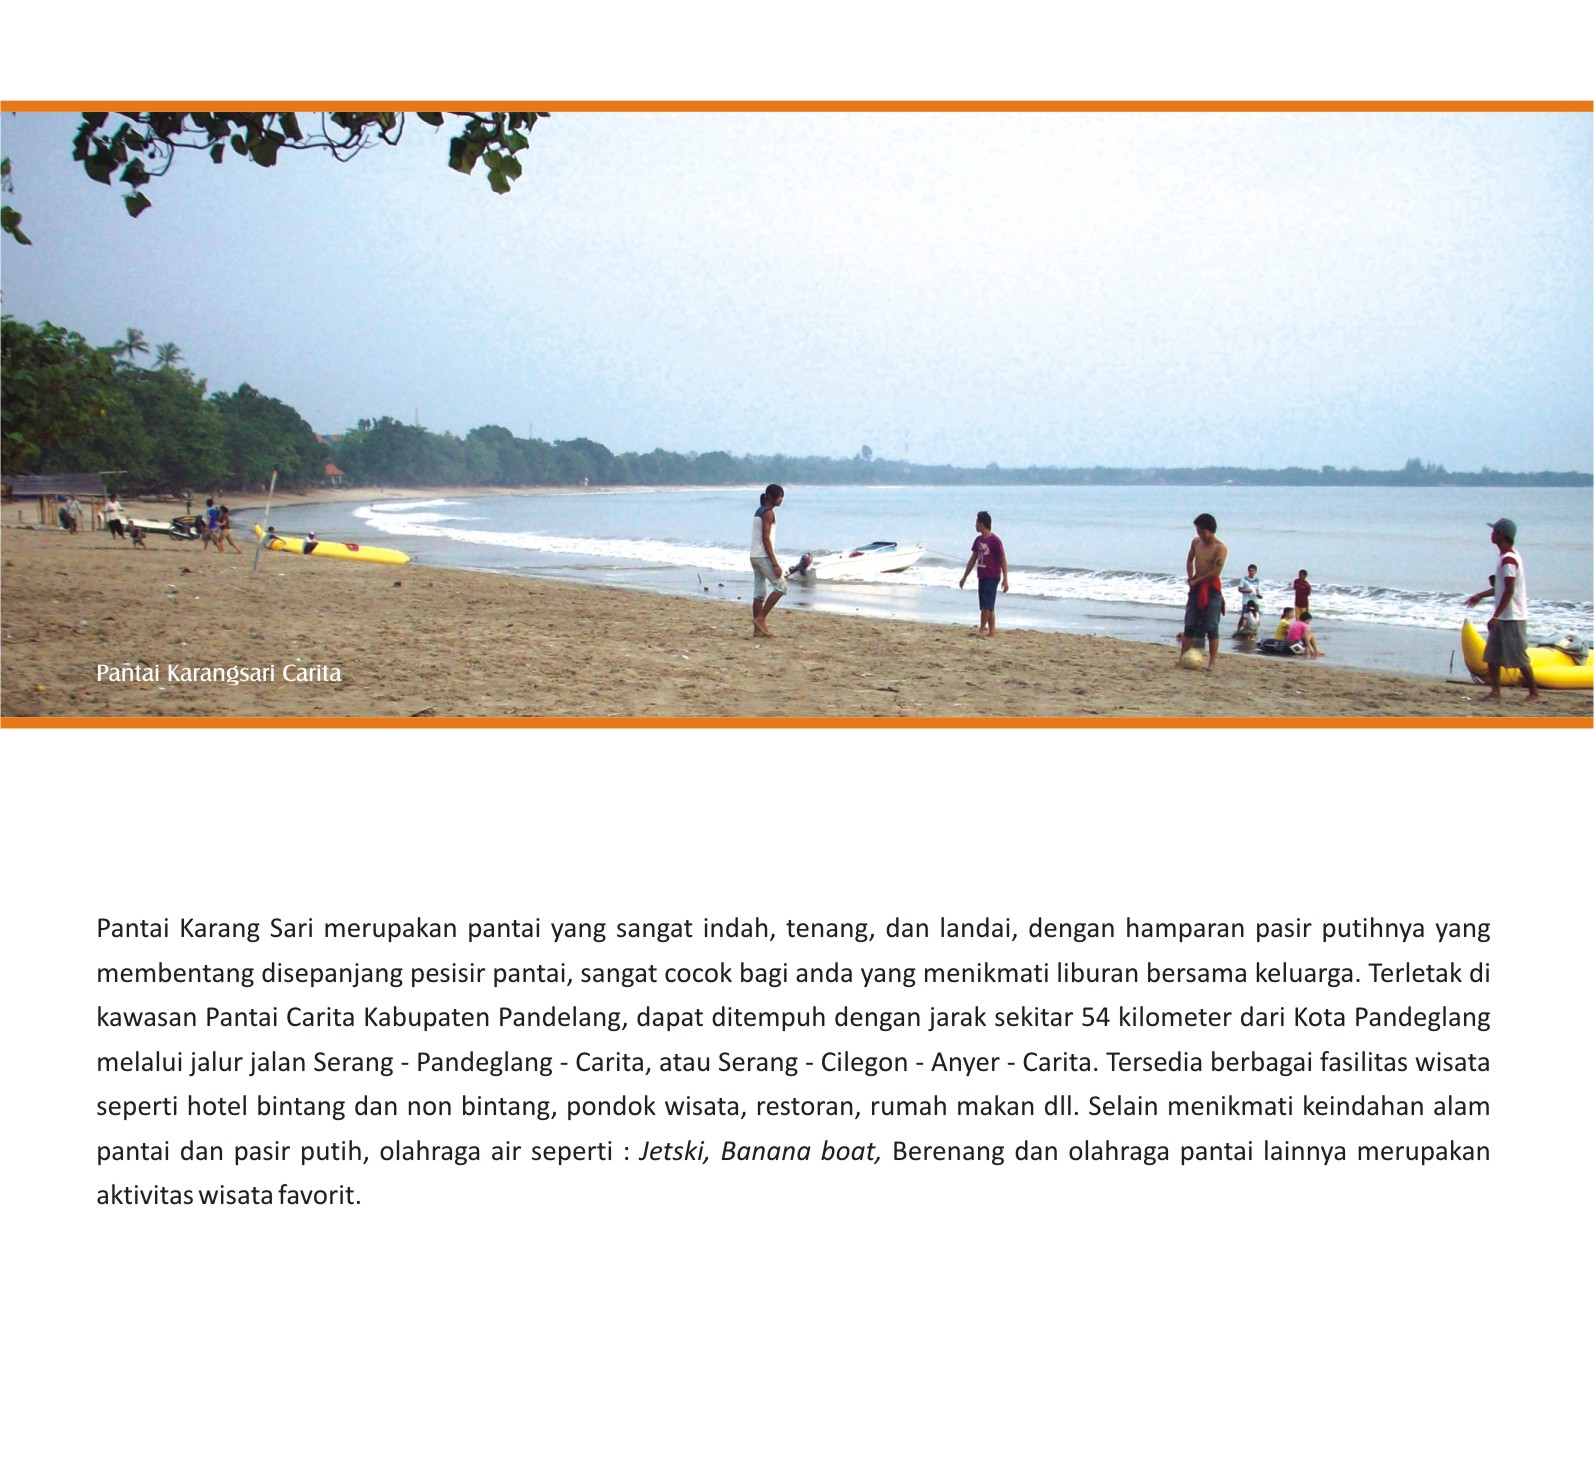 Pesona Wisata Pantai Pandeglang Kenali Daerah Cintai Negeri Click Memperbesar